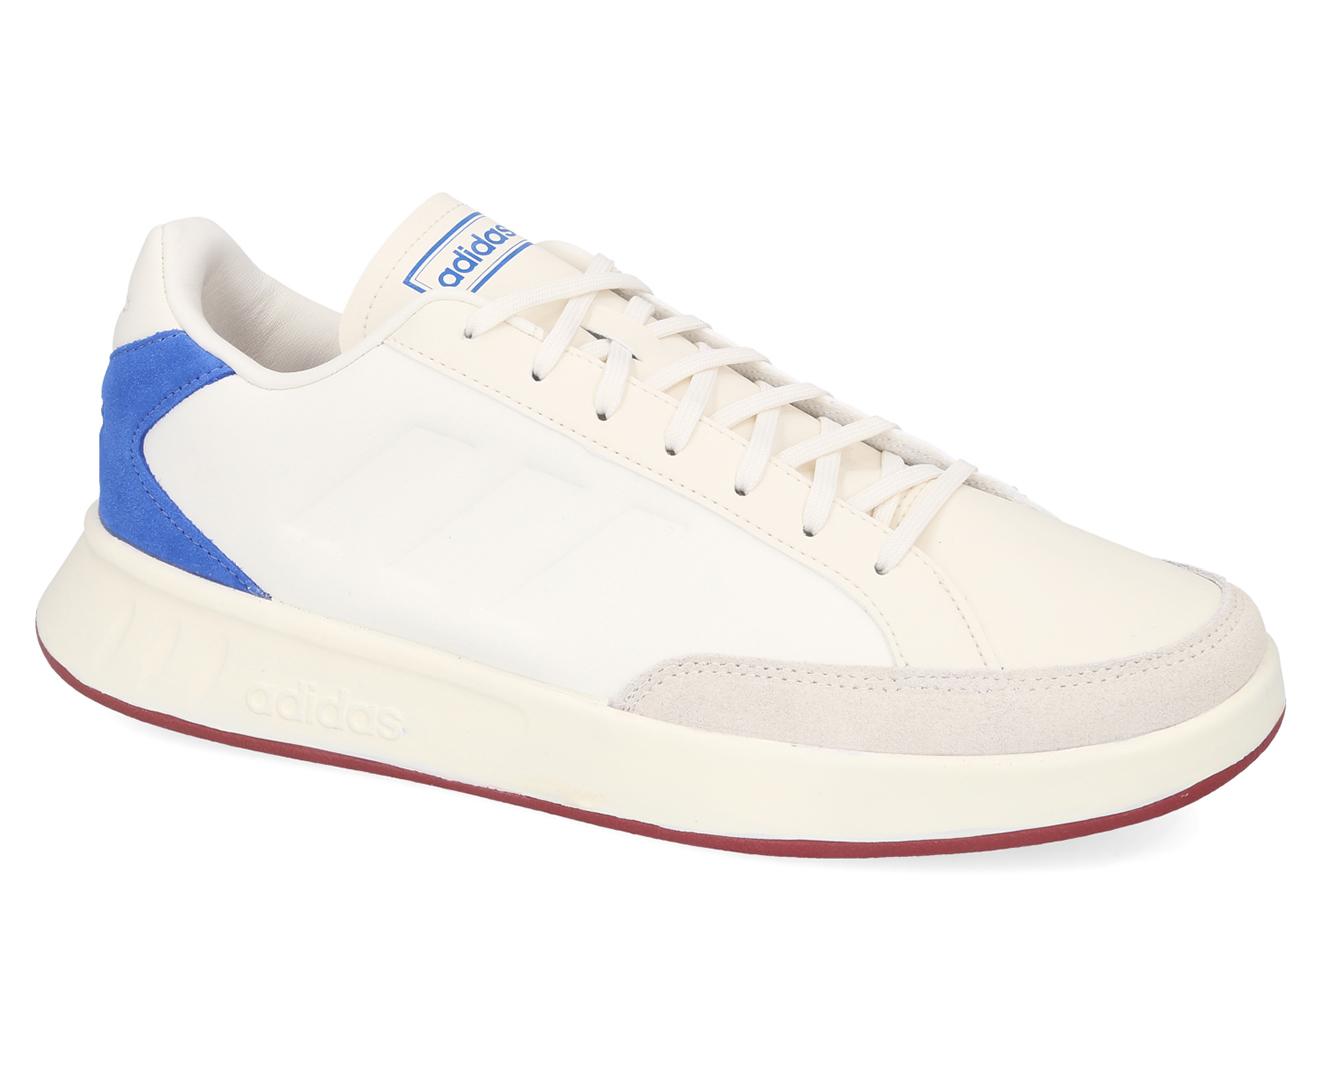 Details about Adidas Men's Netpoint Sneakers WhiteBlue